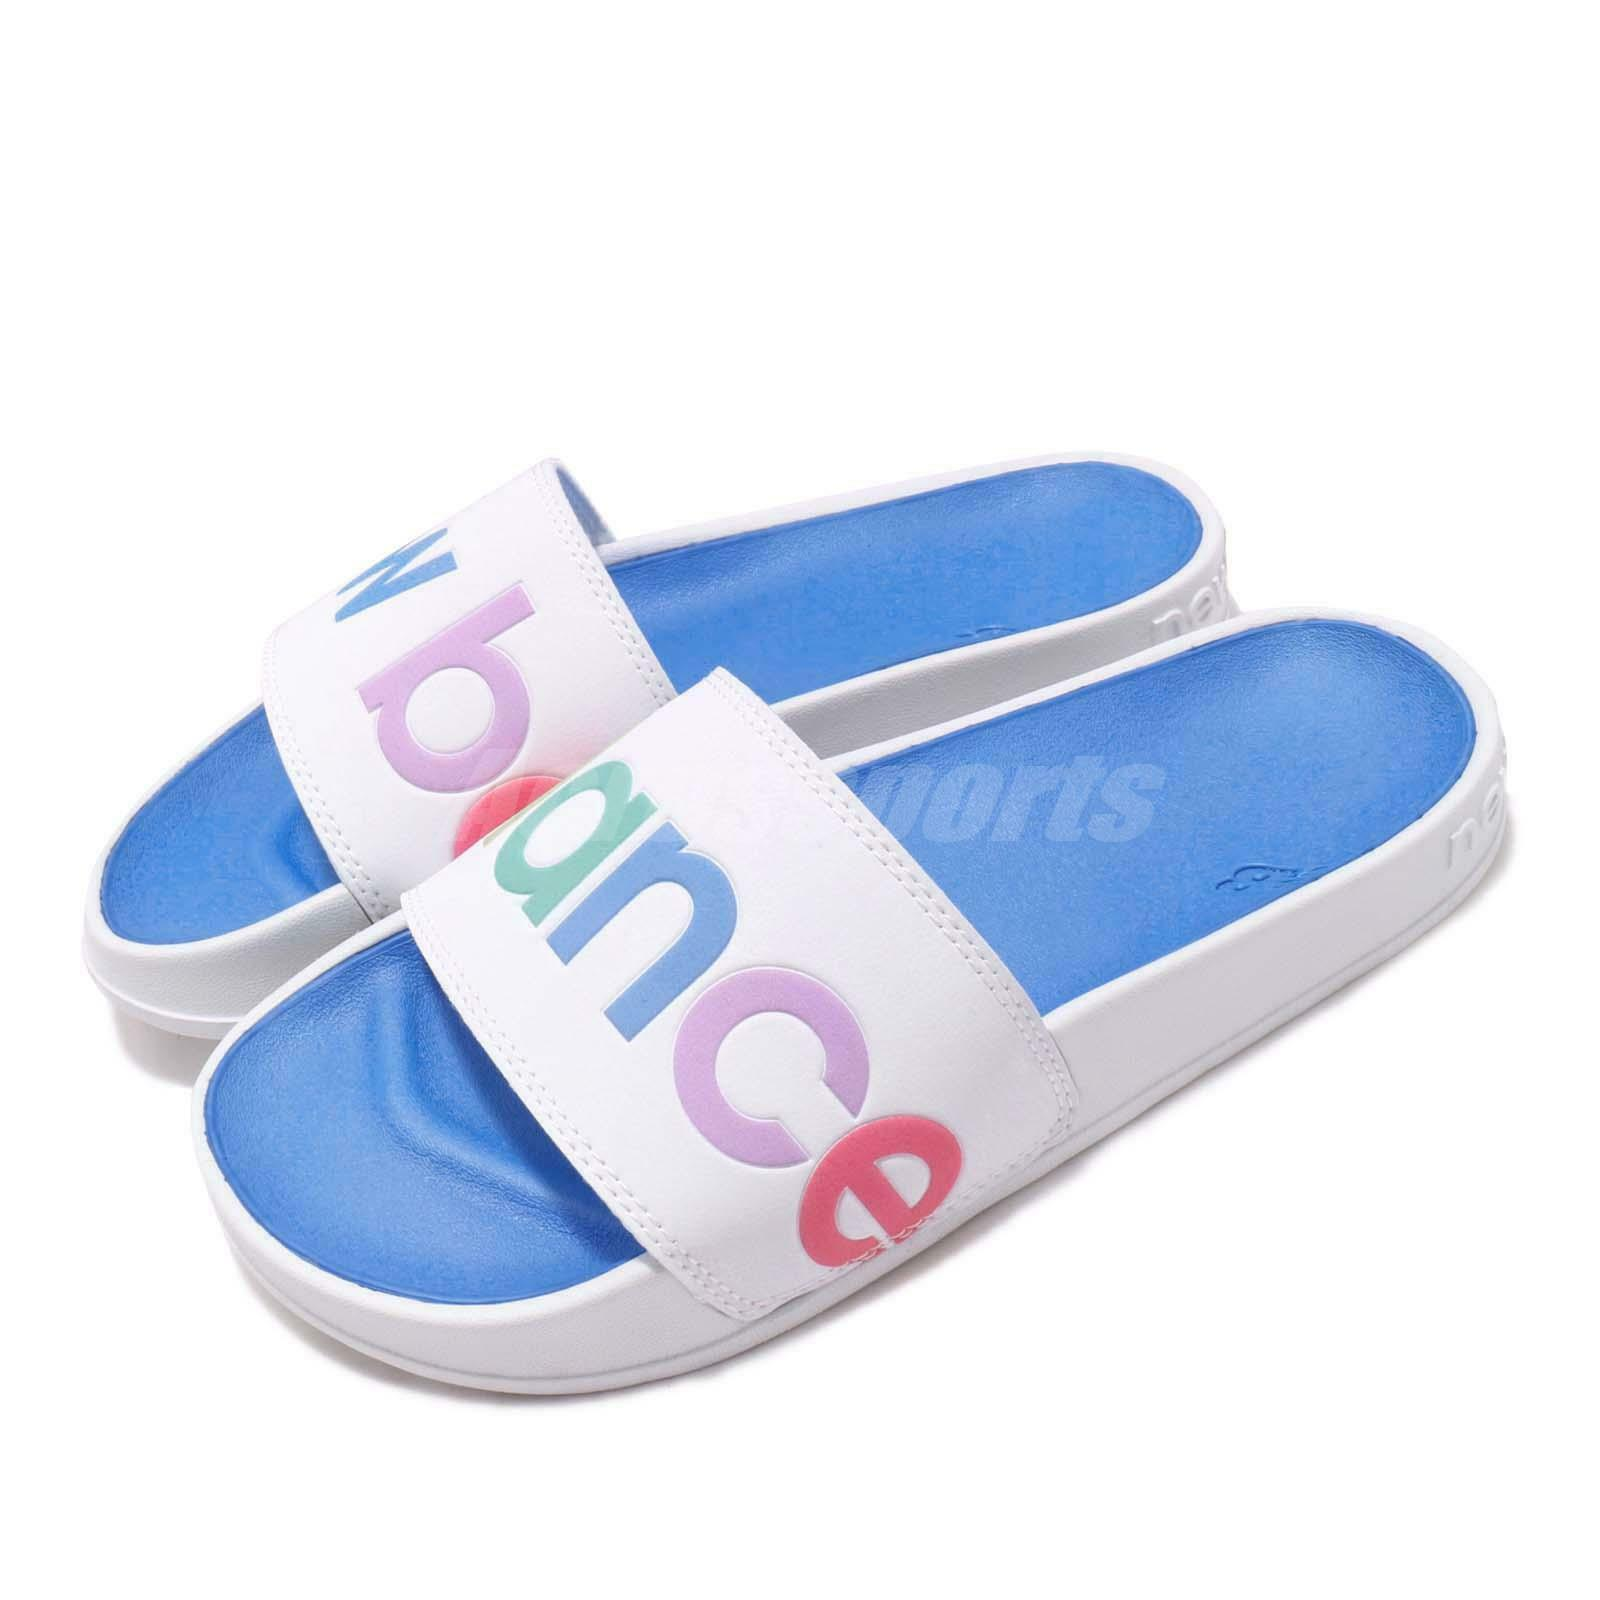 New Balance SWF200A1 B blanc Multi-Couleur bleu Mens femmes Sandal Slide SWF200A1B